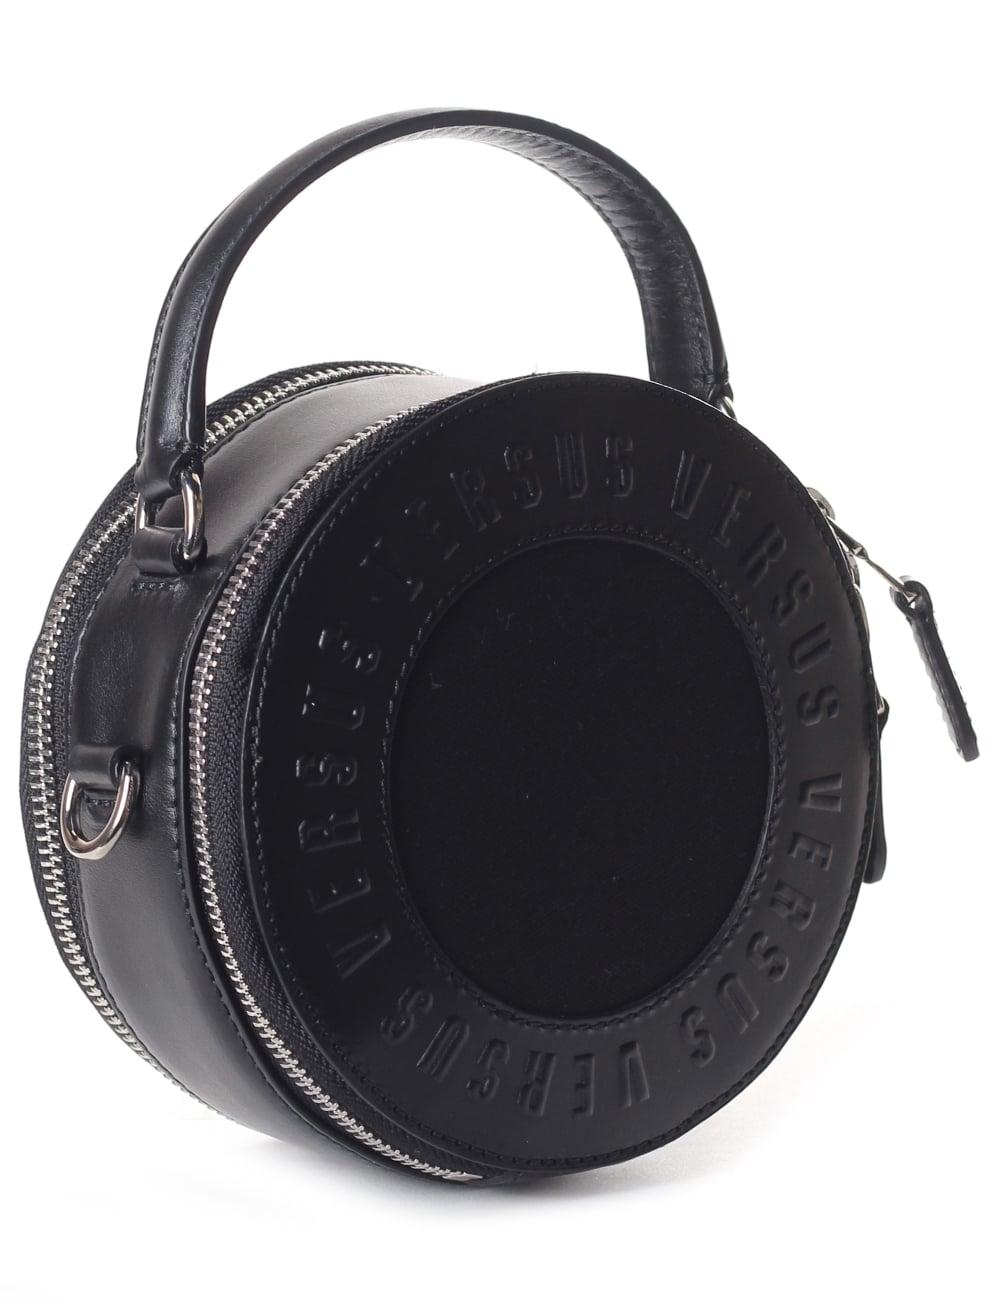 9b3233919fee Versus Versace Men s Logo Embossed Shoulder Bag